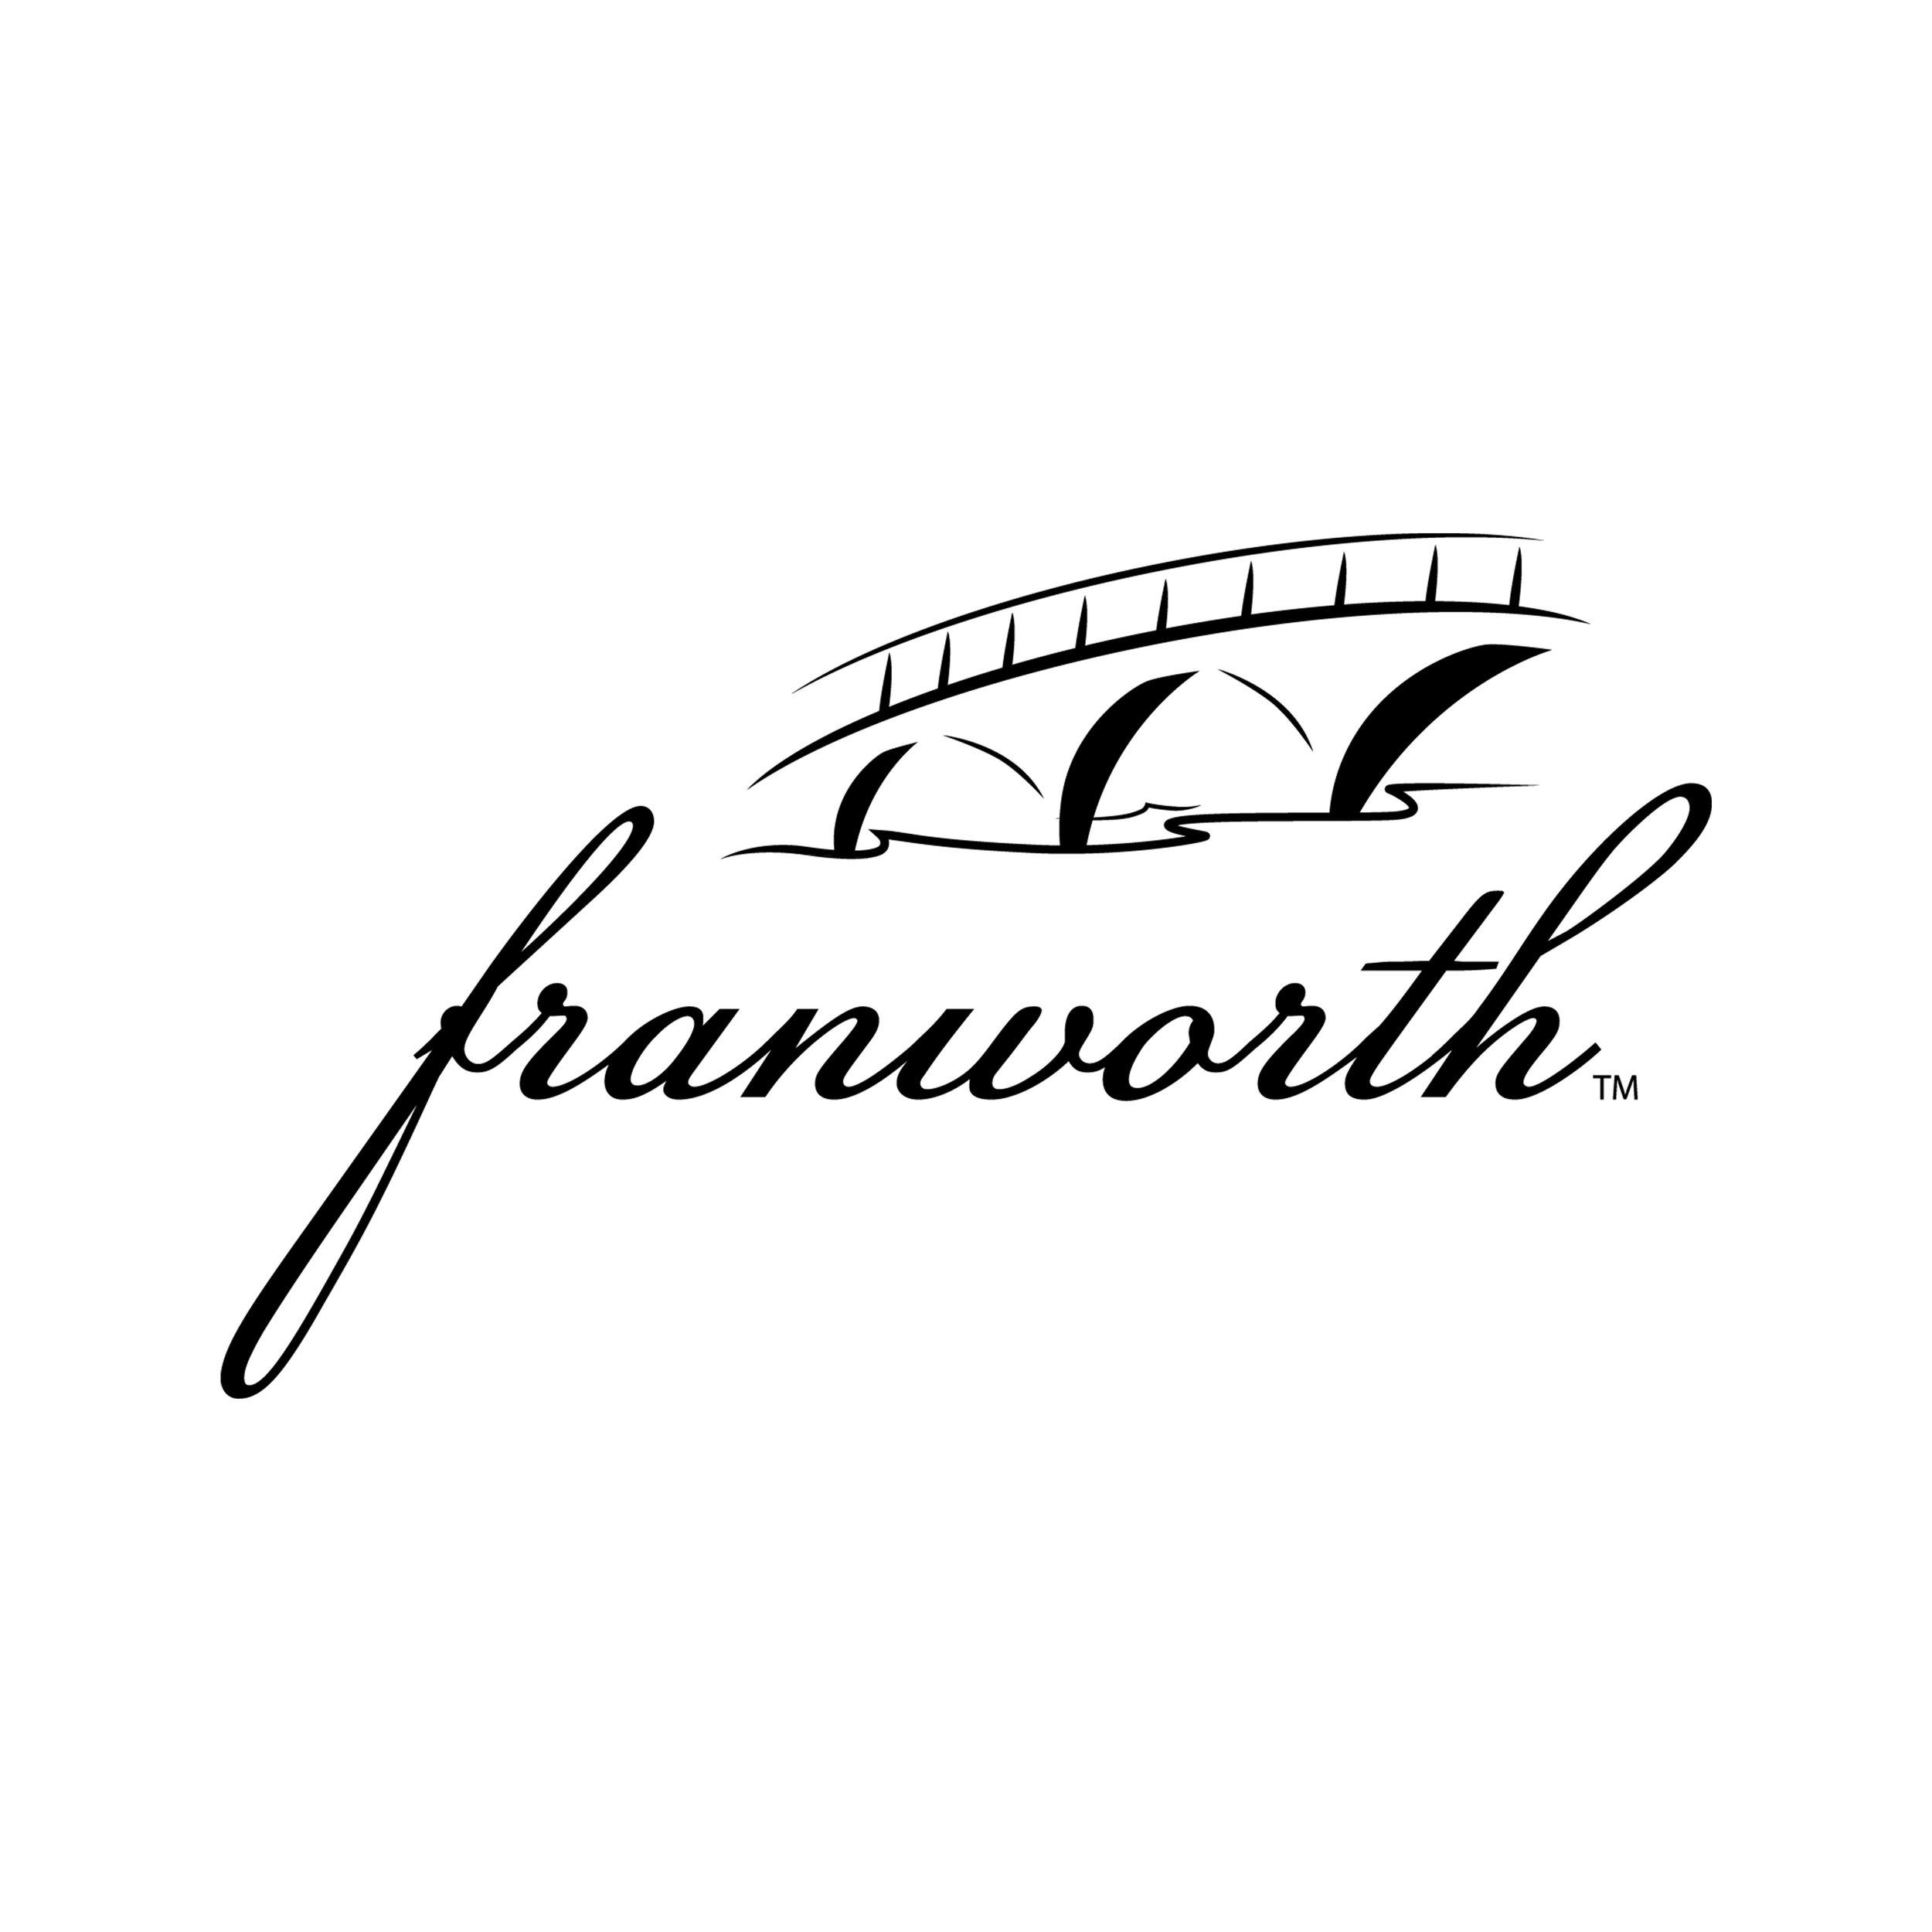 Franworth Logo.jpg